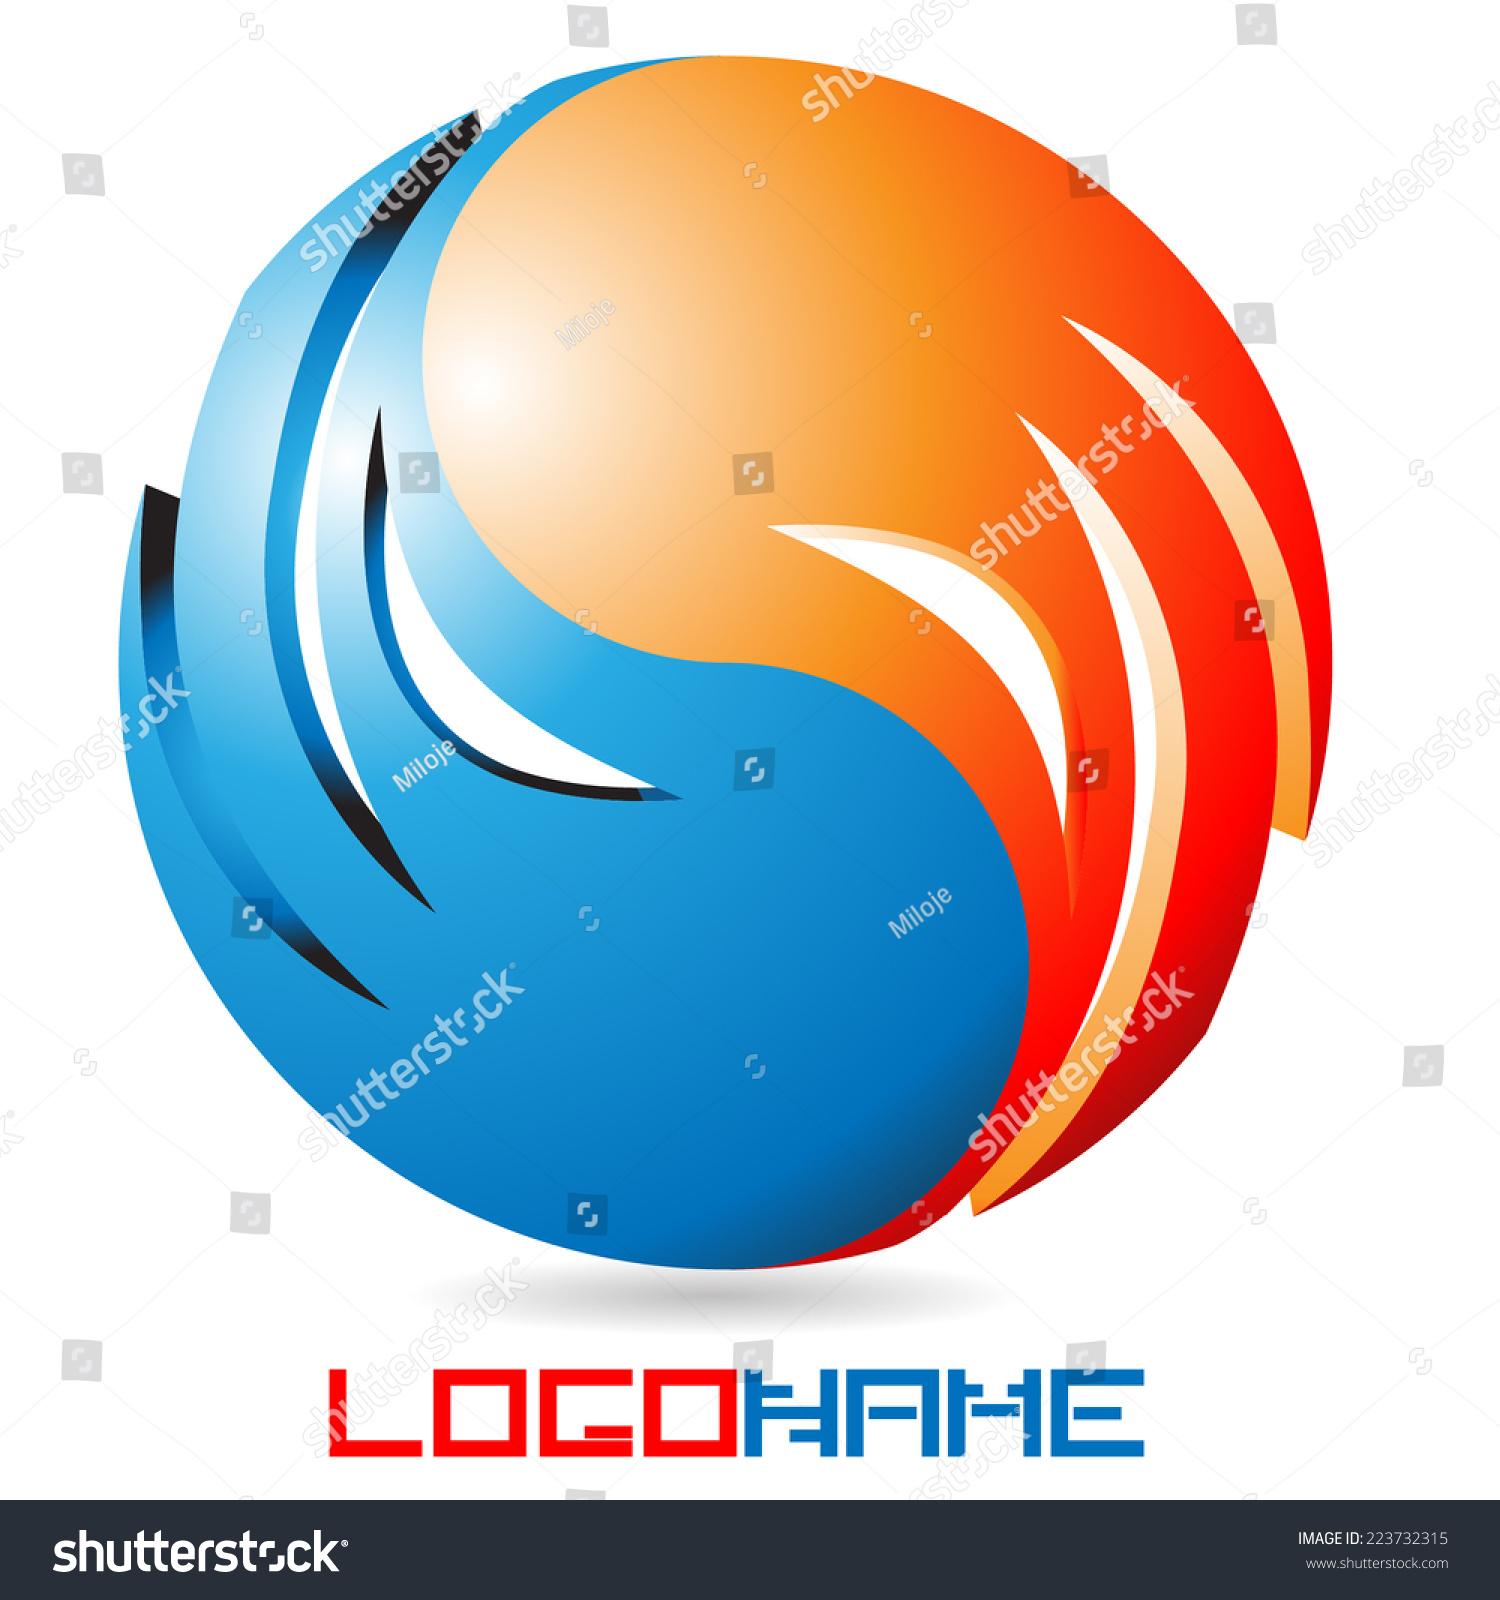 vector fire water drop logo icon stock vector 223732315 shutterstock rh shutterstock com Yin Yang Symbol Designs Yin Yang Transparent